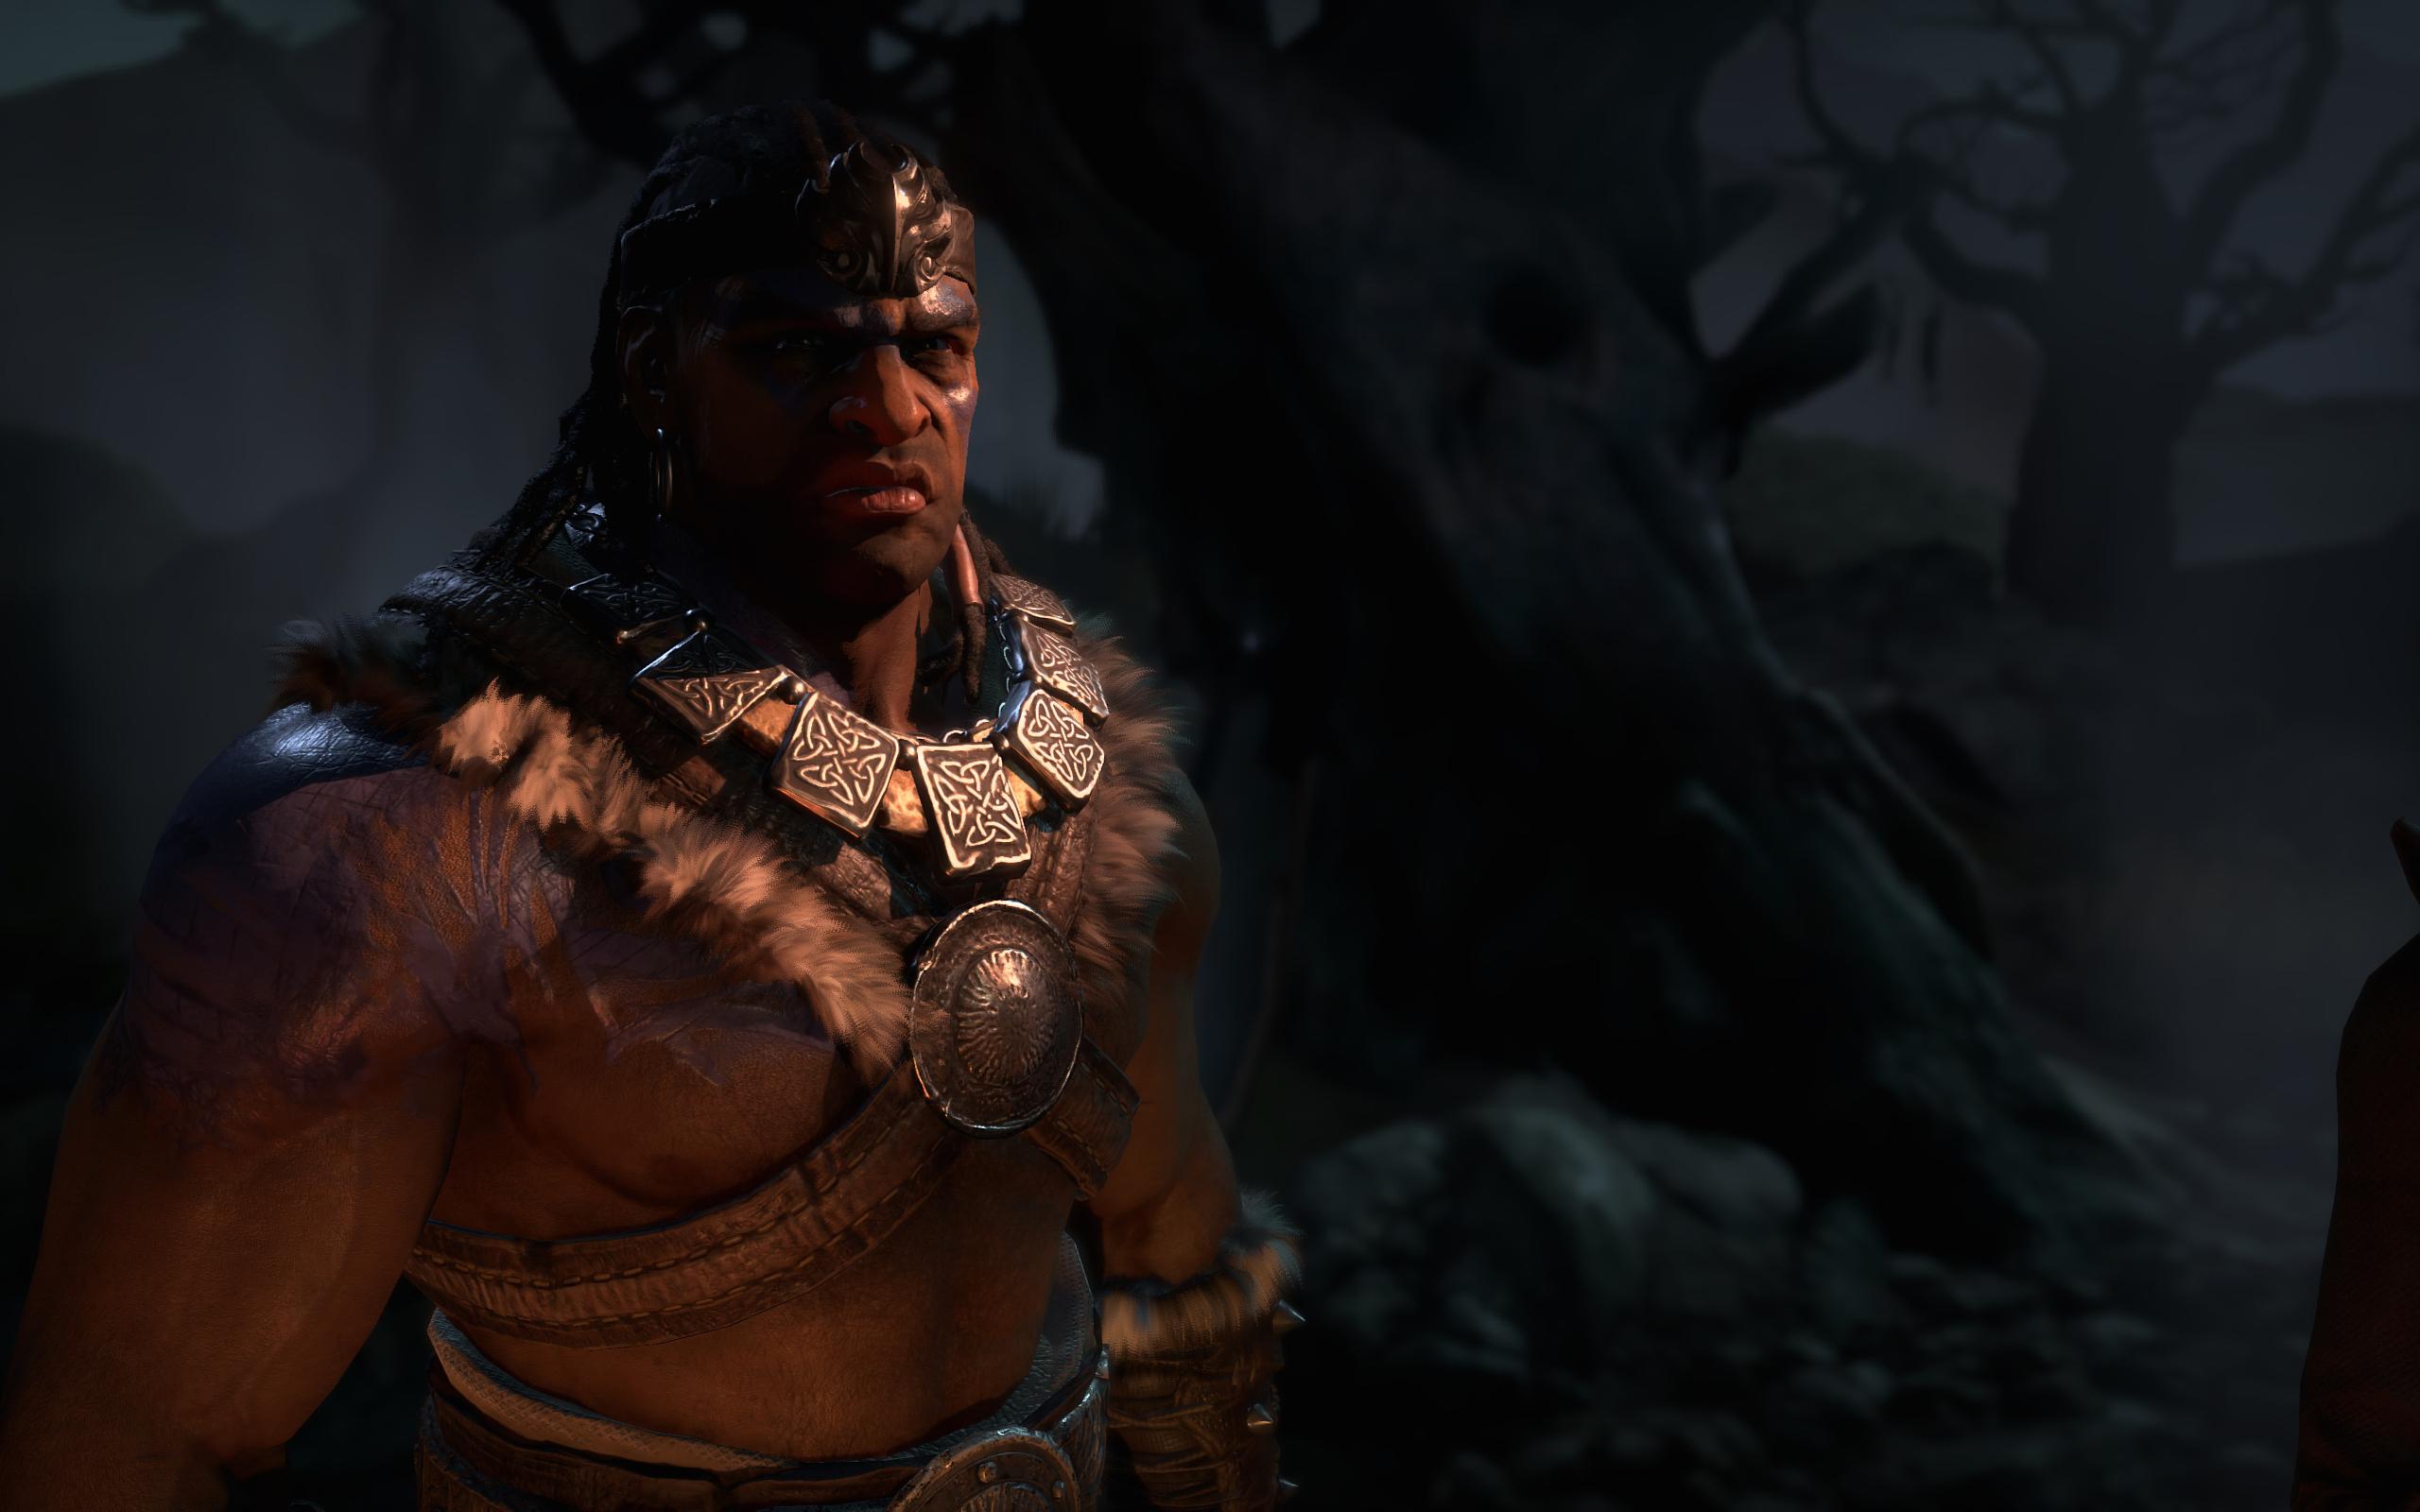 Diablo 4's Barbarian class